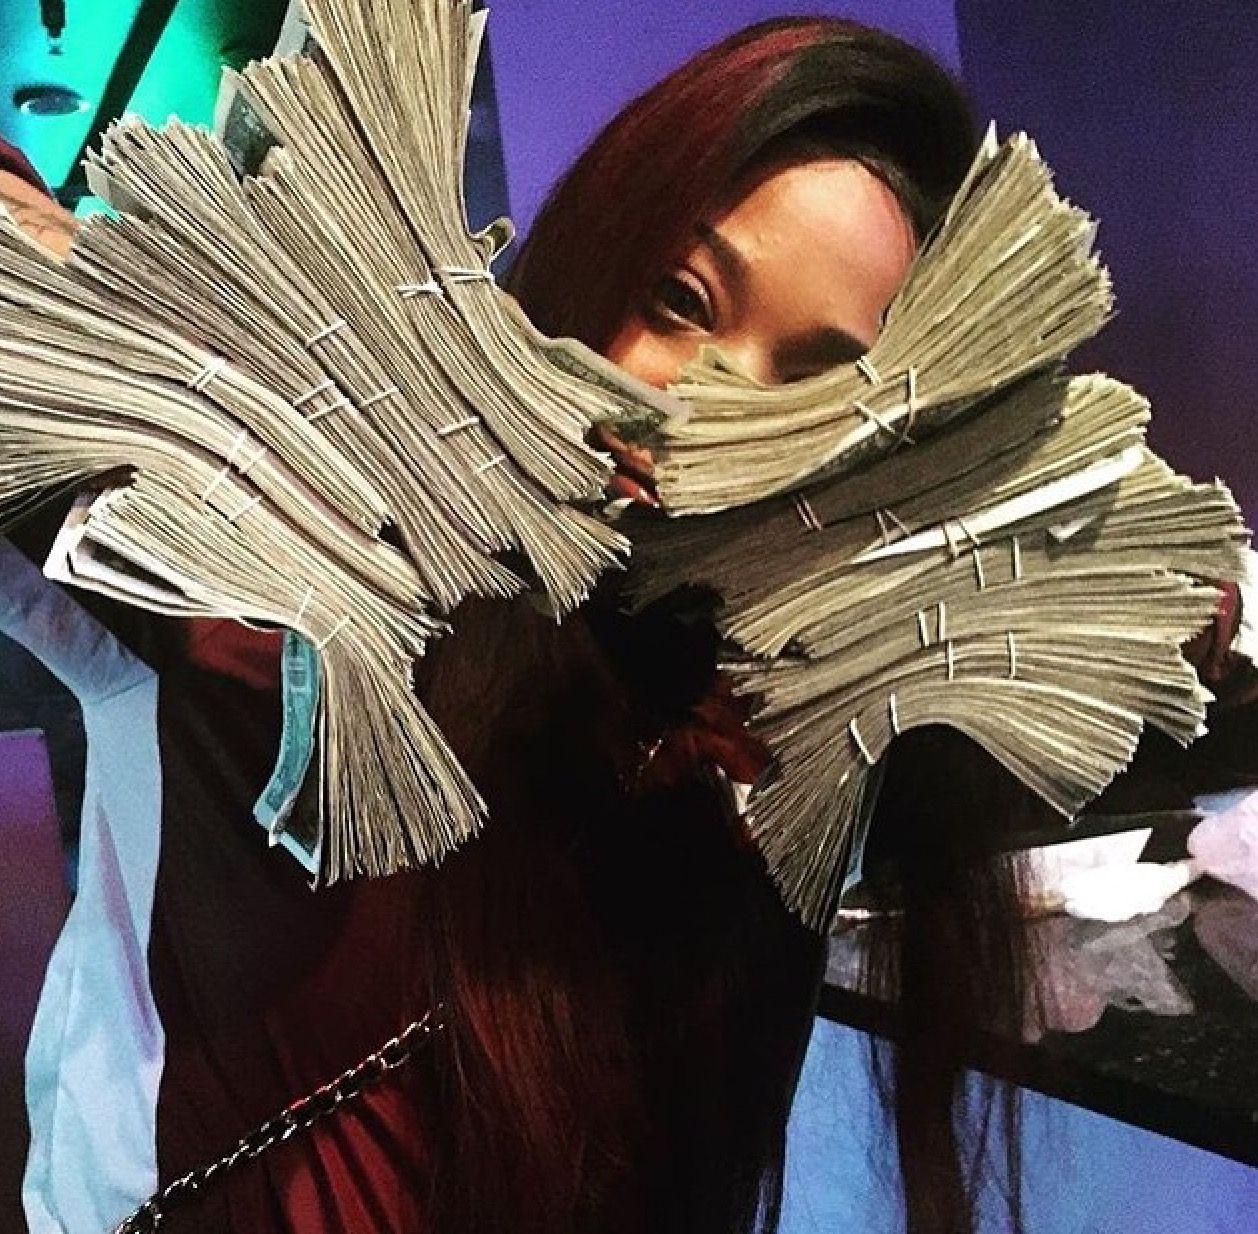 Money Pinterest: OfficiallyErra (With images) | Gangster ...